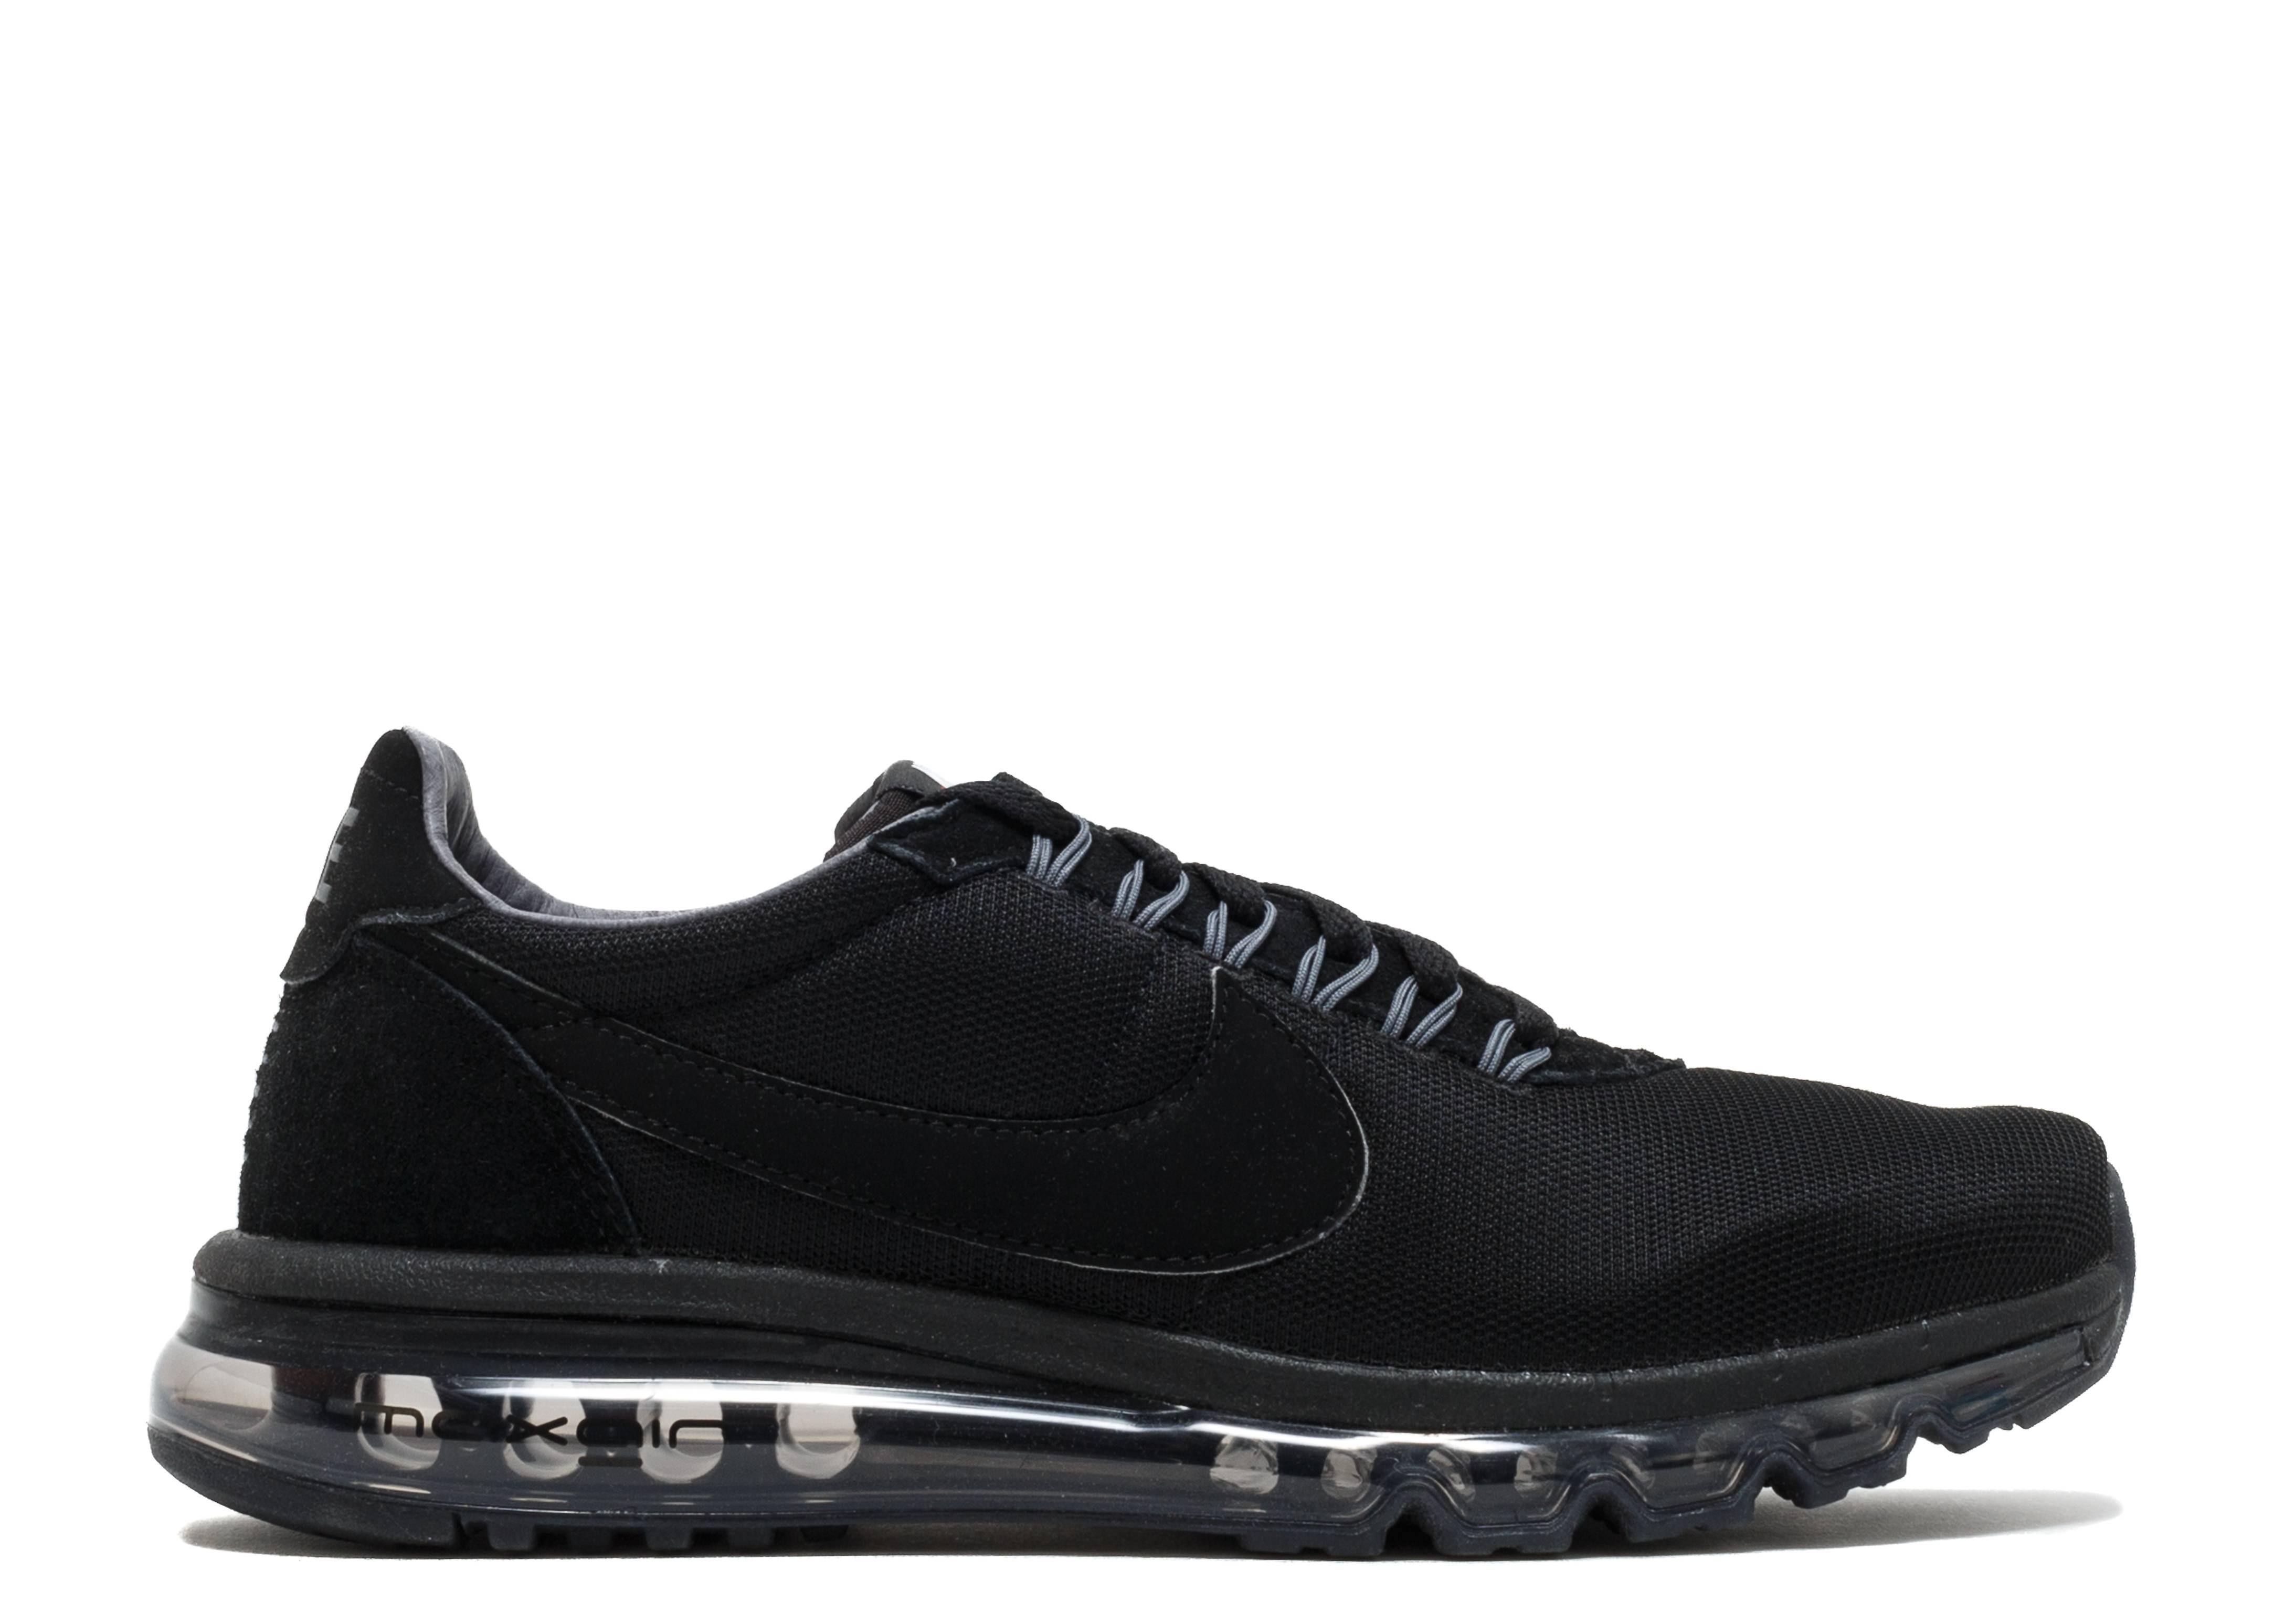 online store c6de0 2b064 ... Air Max LD-Zero - Nike - 848624 005 - black black-dark grey ...